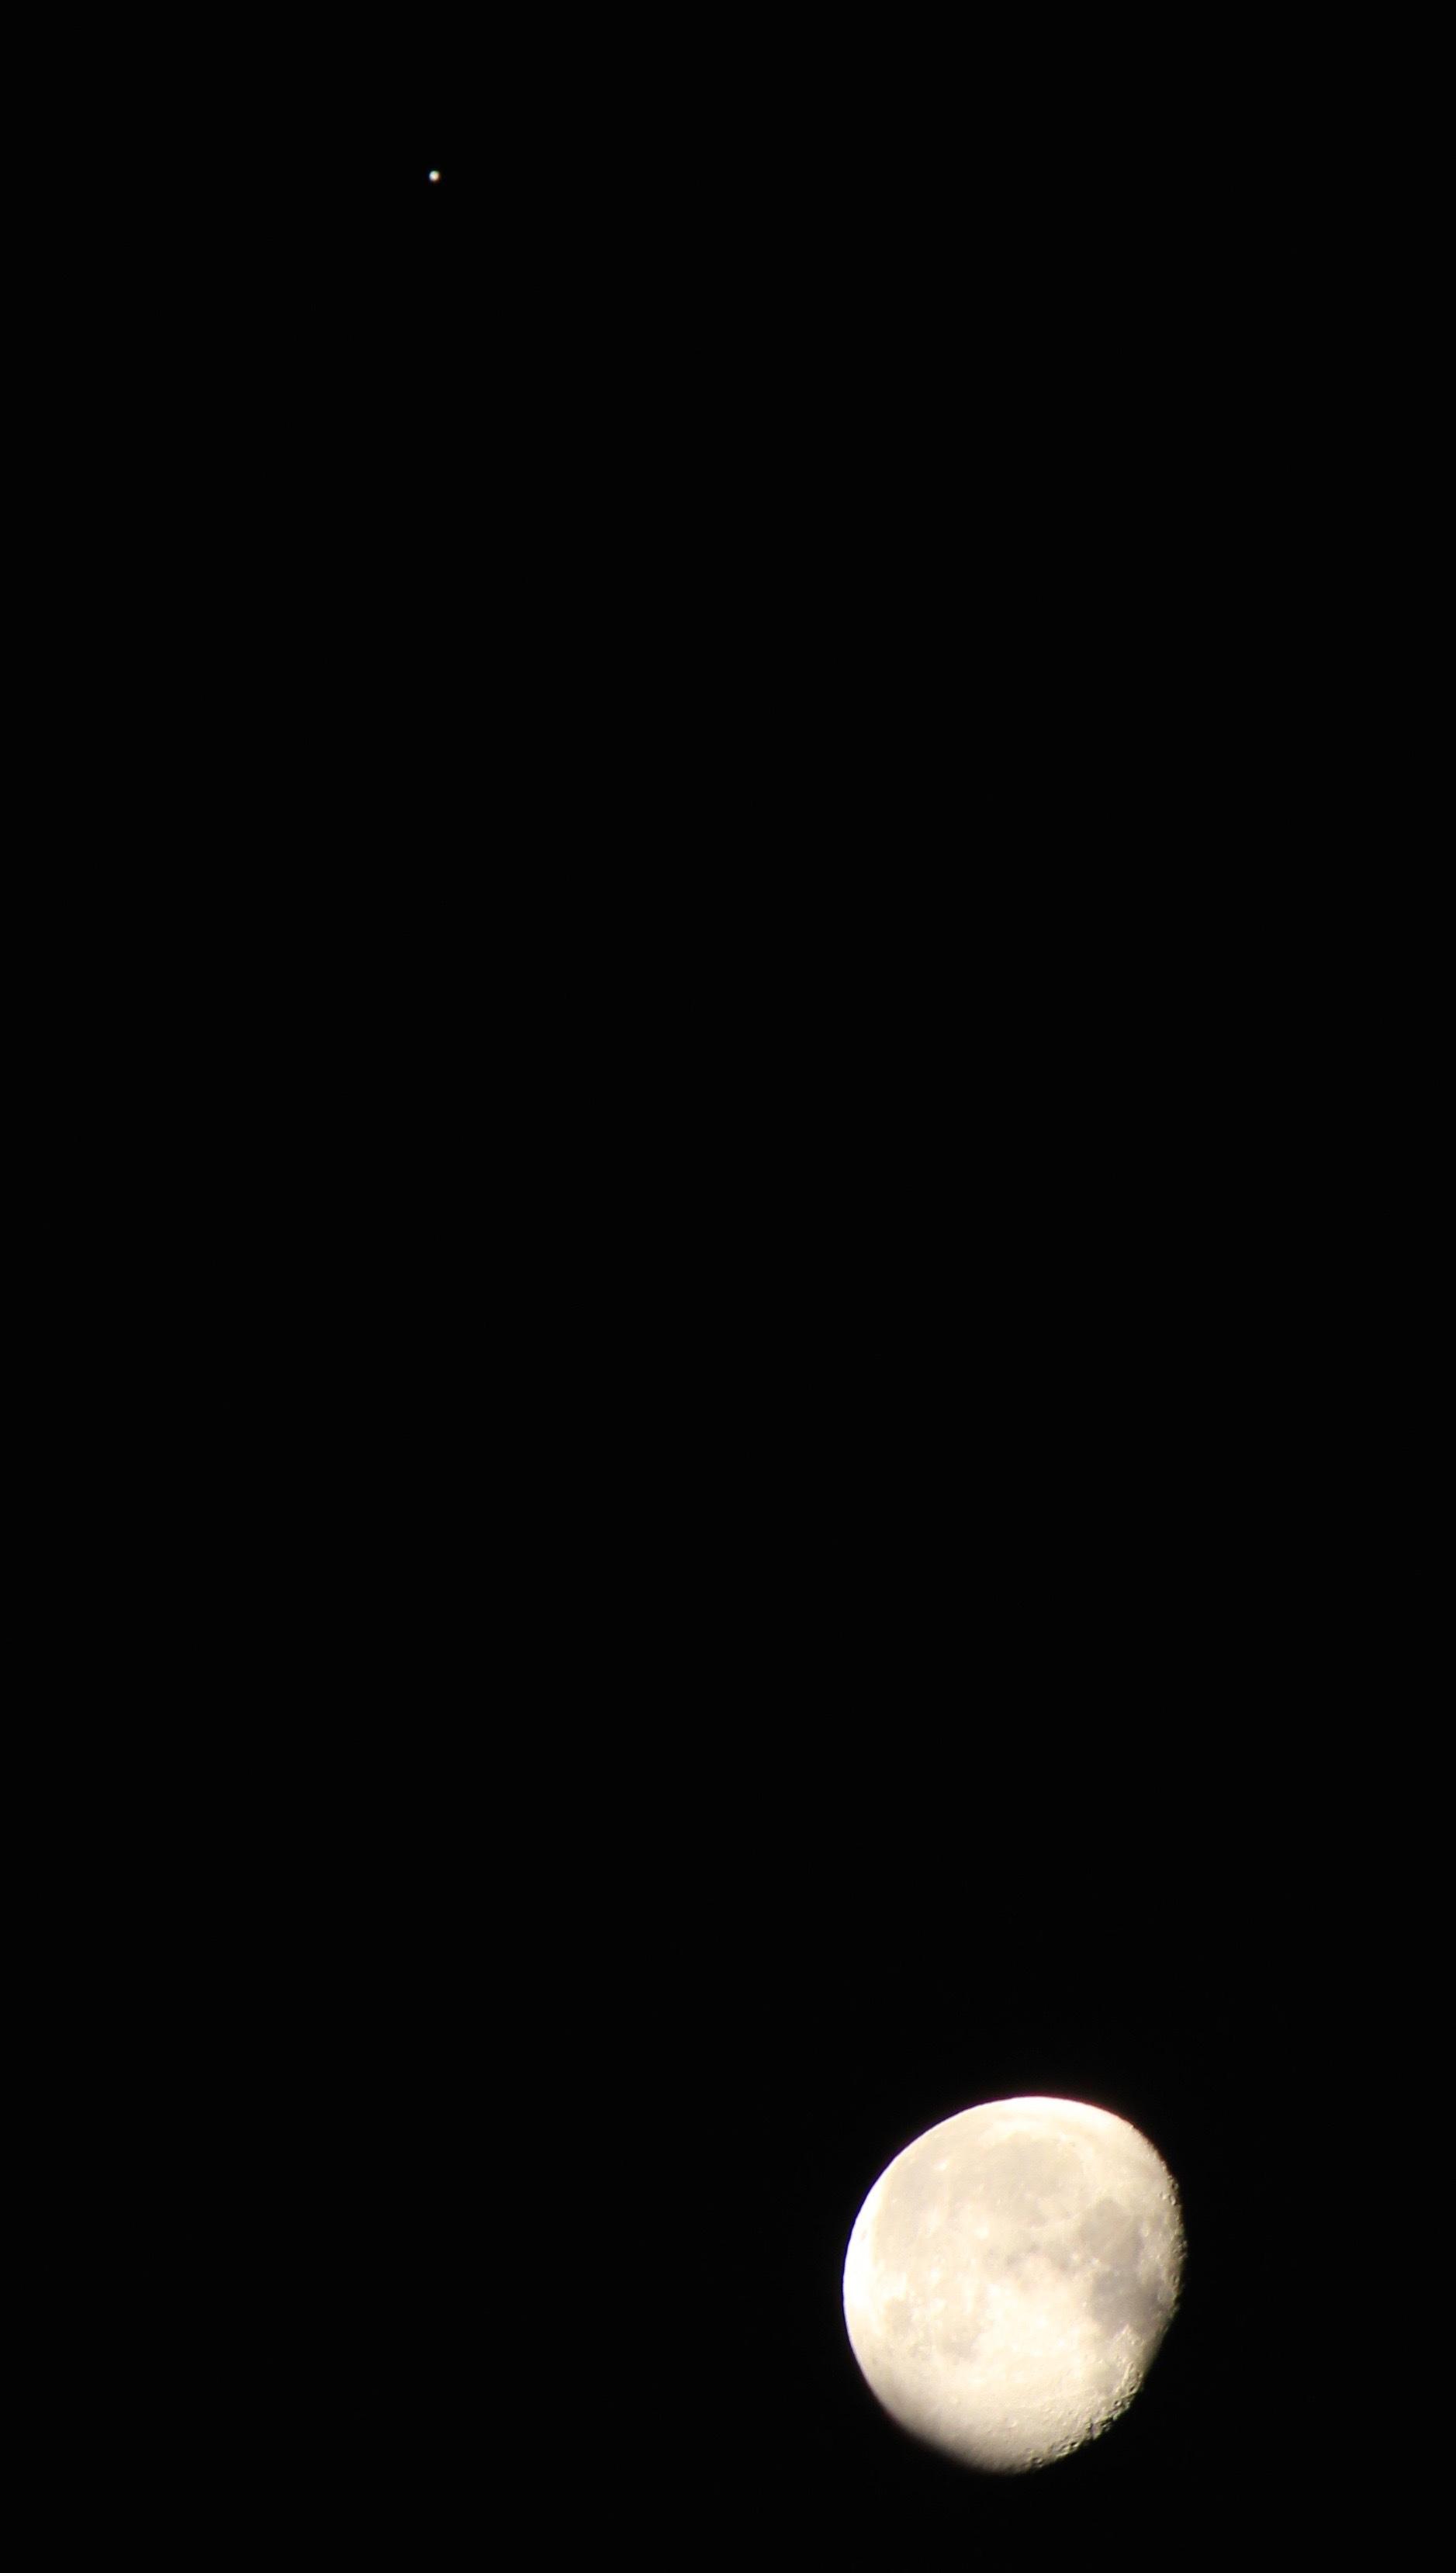 a0248459_15283669.jpg